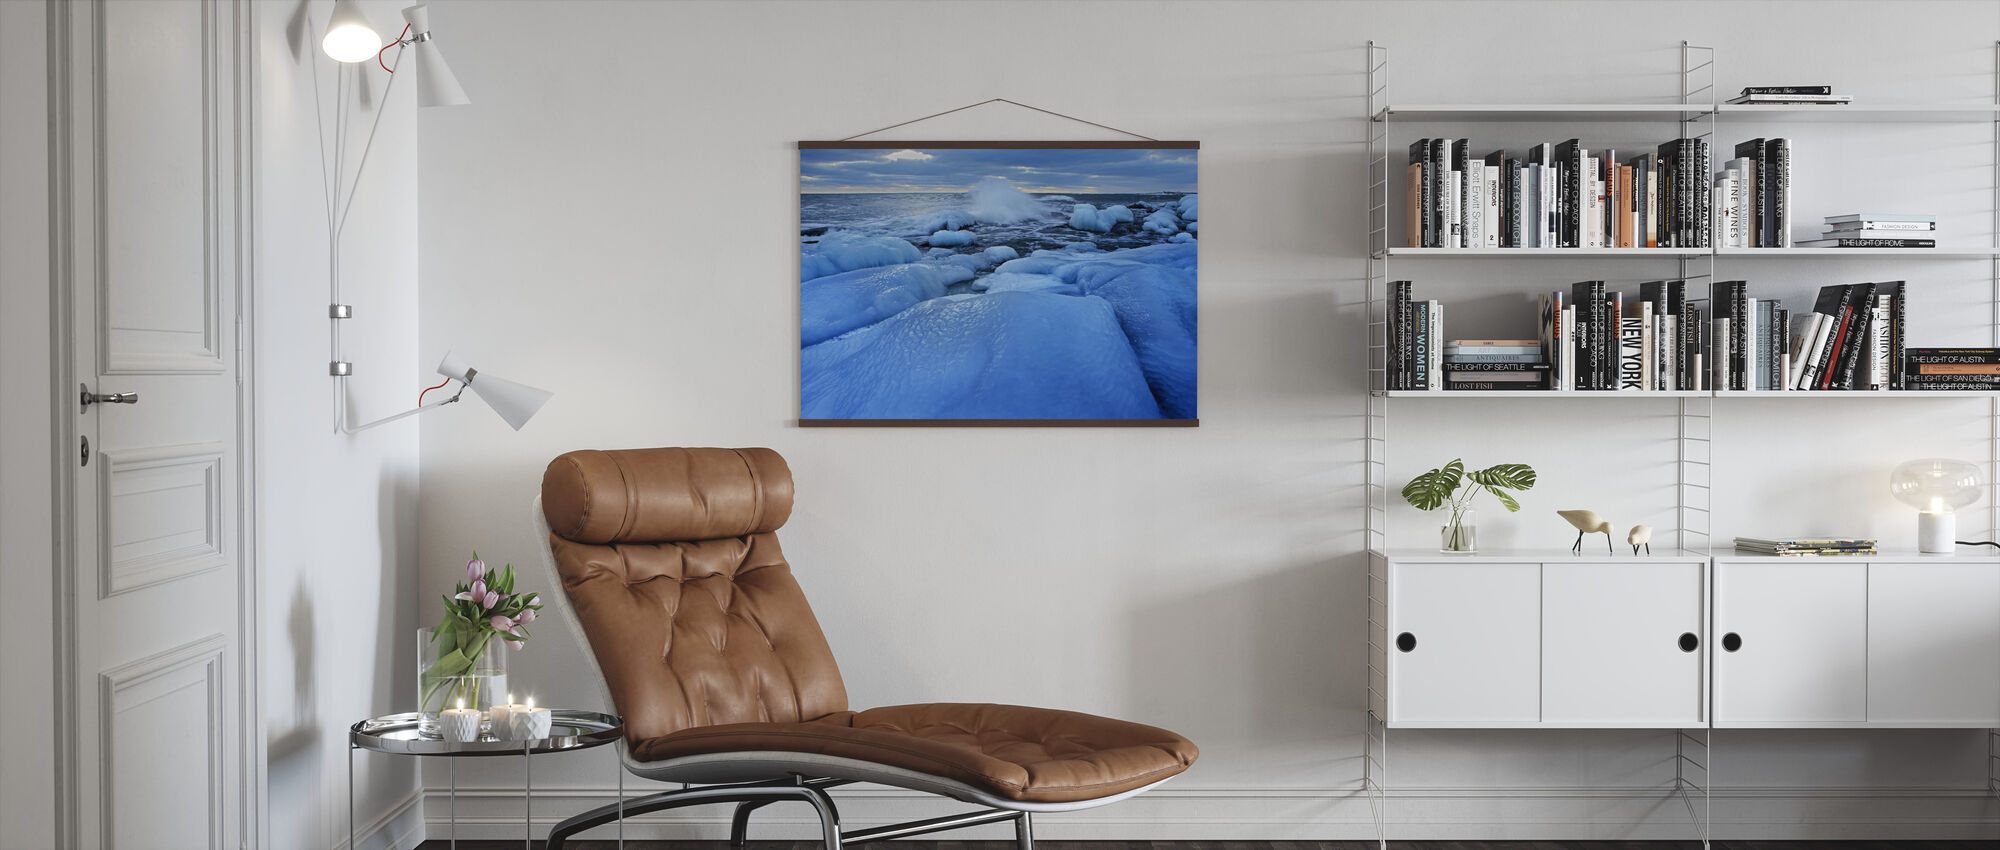 A Wintersday, Grisslehamn Sweden - Poster - Living Room